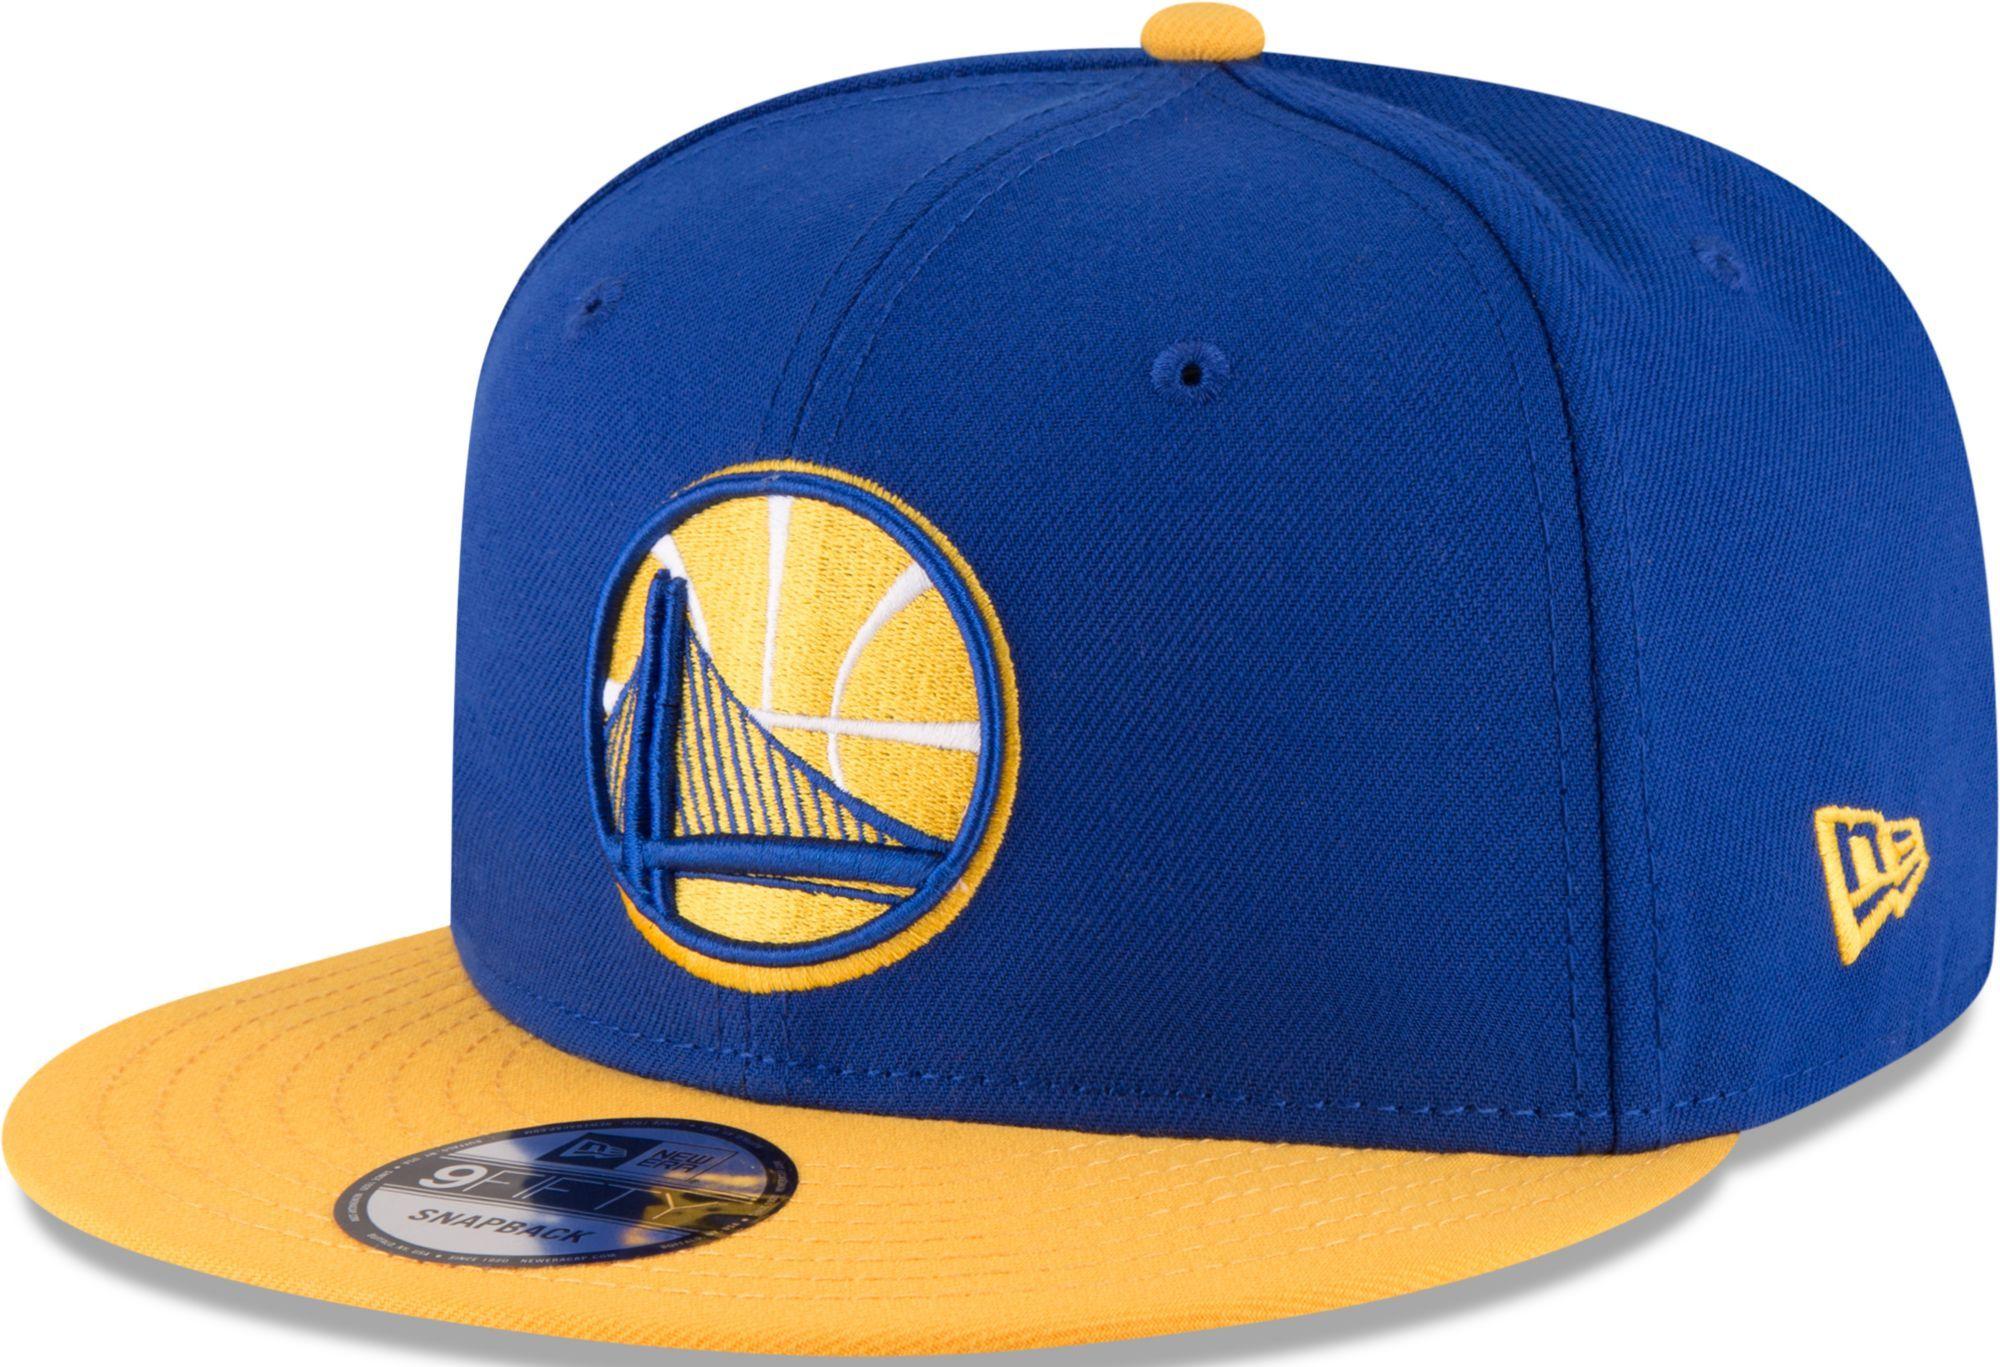 b10d07391b0a31 New Era Men's Golden State Warriors 9Fifty 2Tone Adjustable Snapback Hat